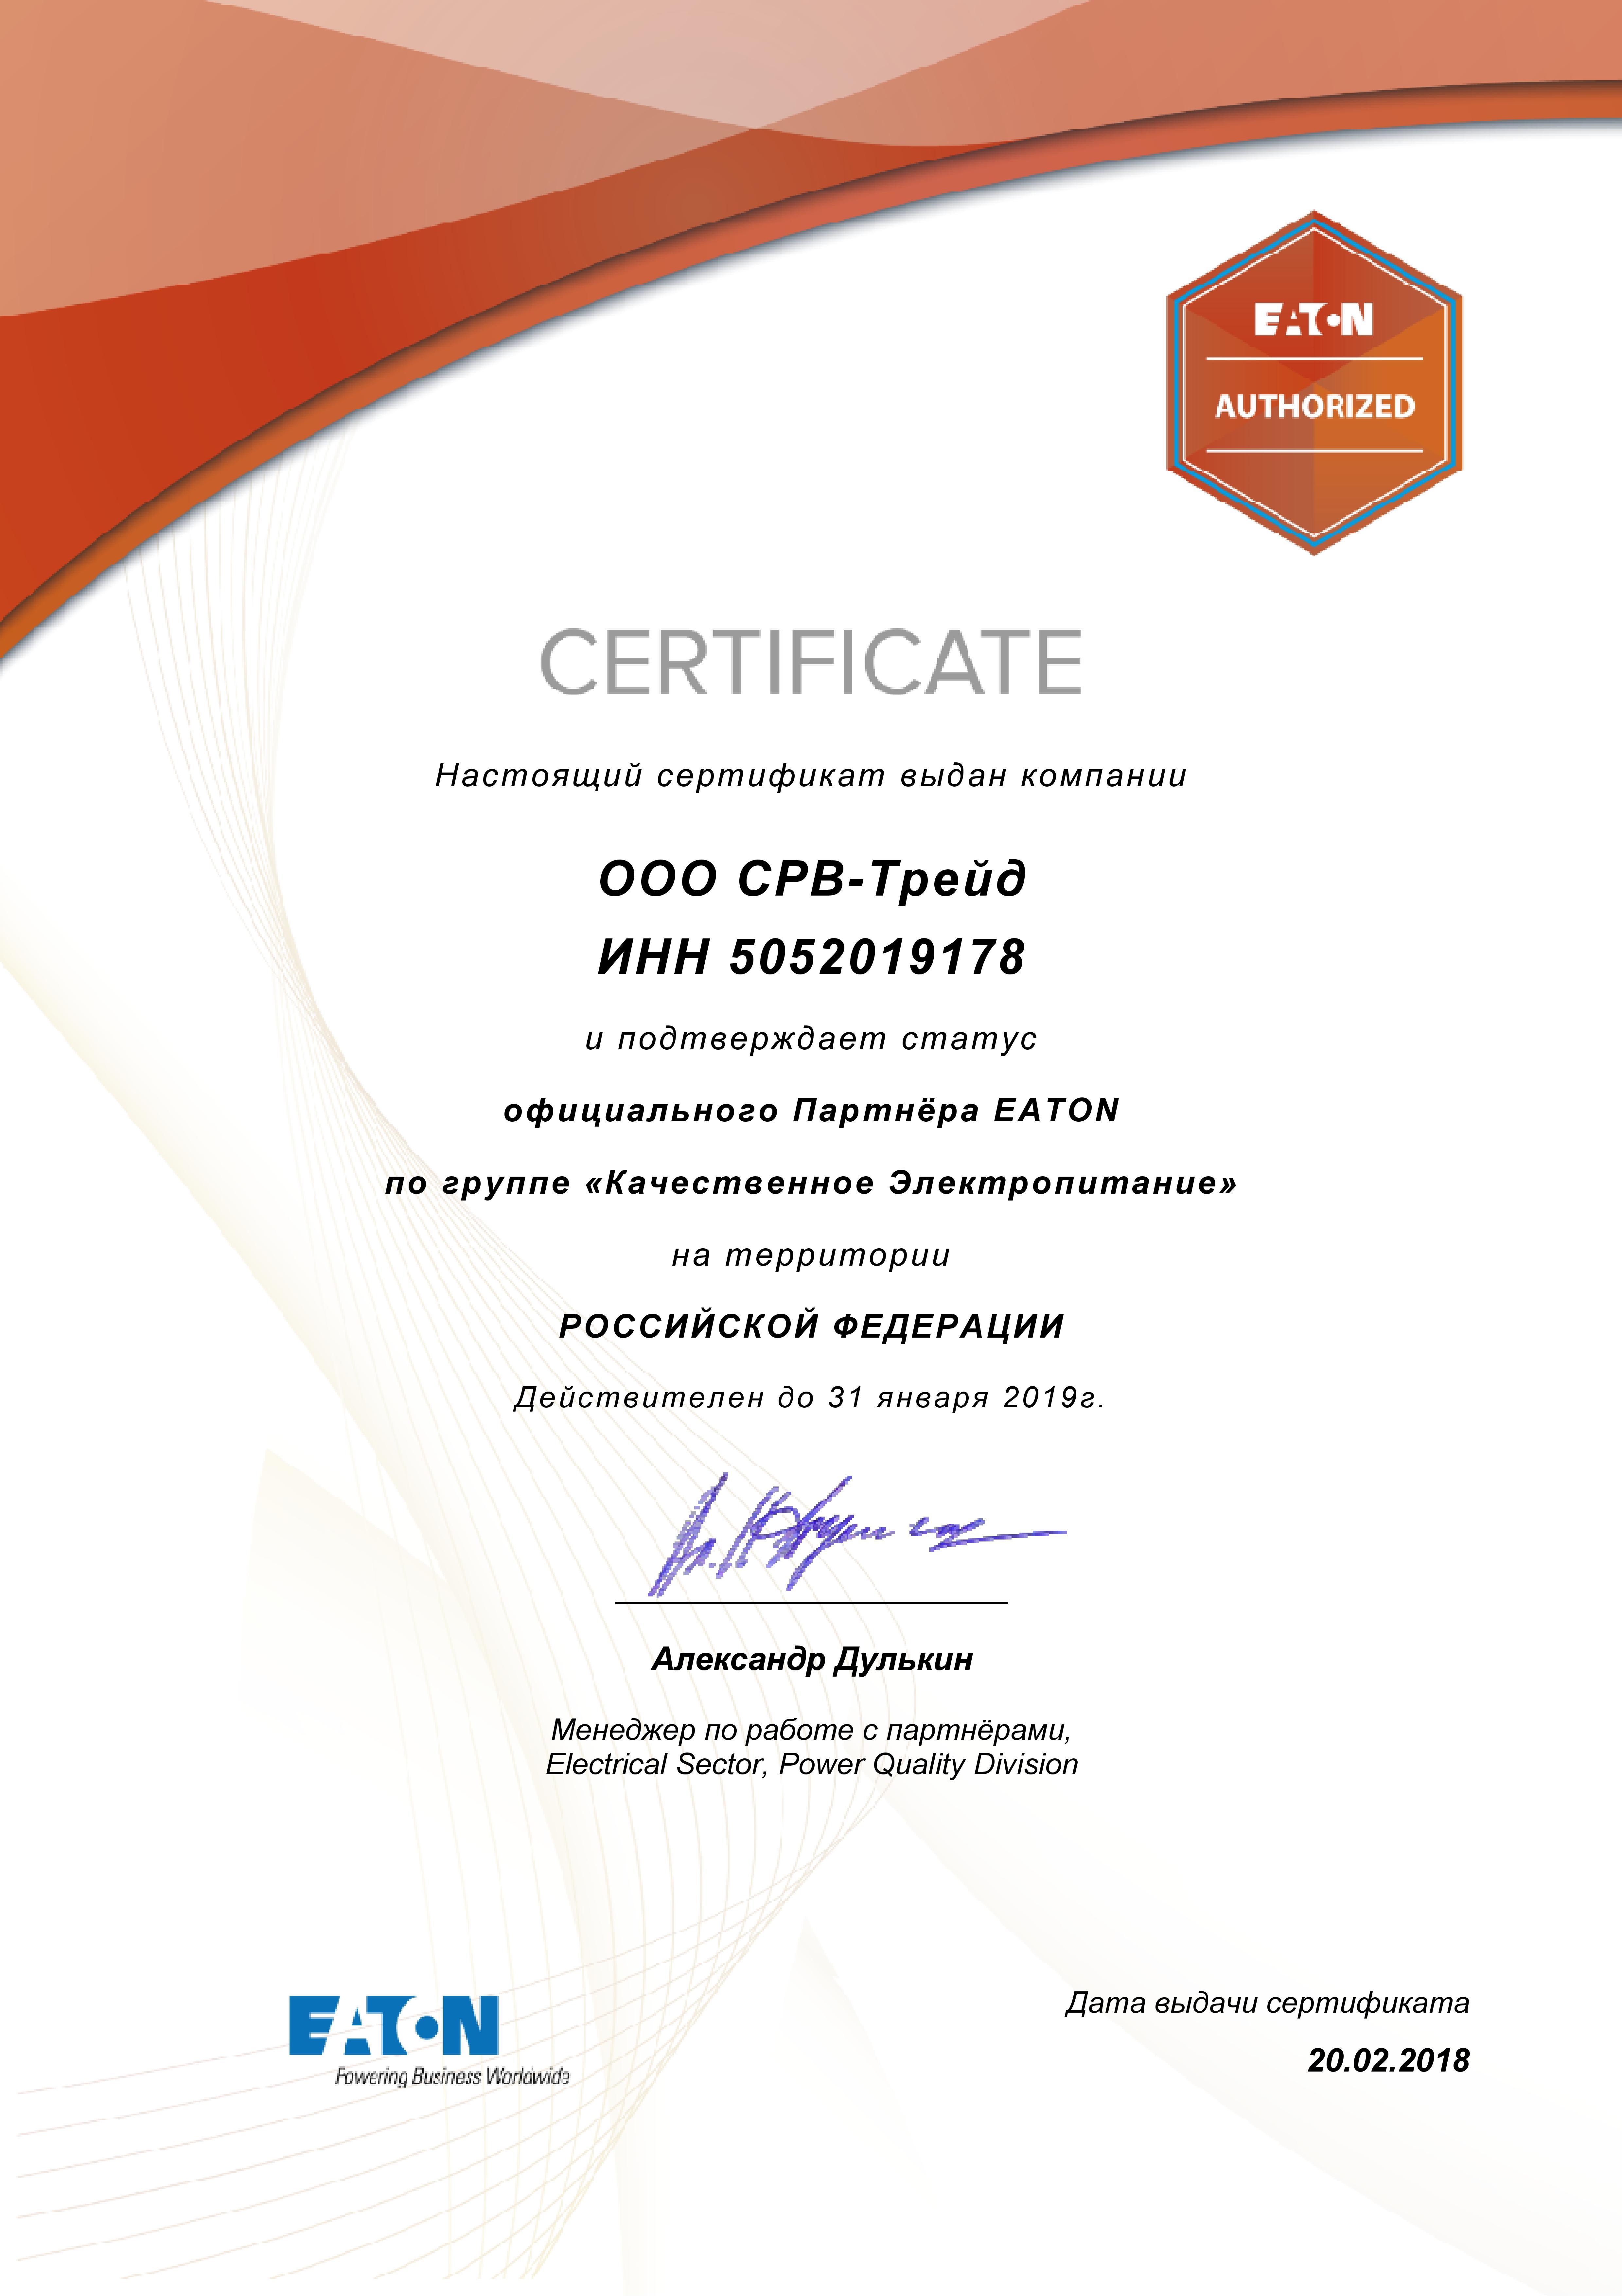 Сертификат SRV-TRADE как партнера Eaton